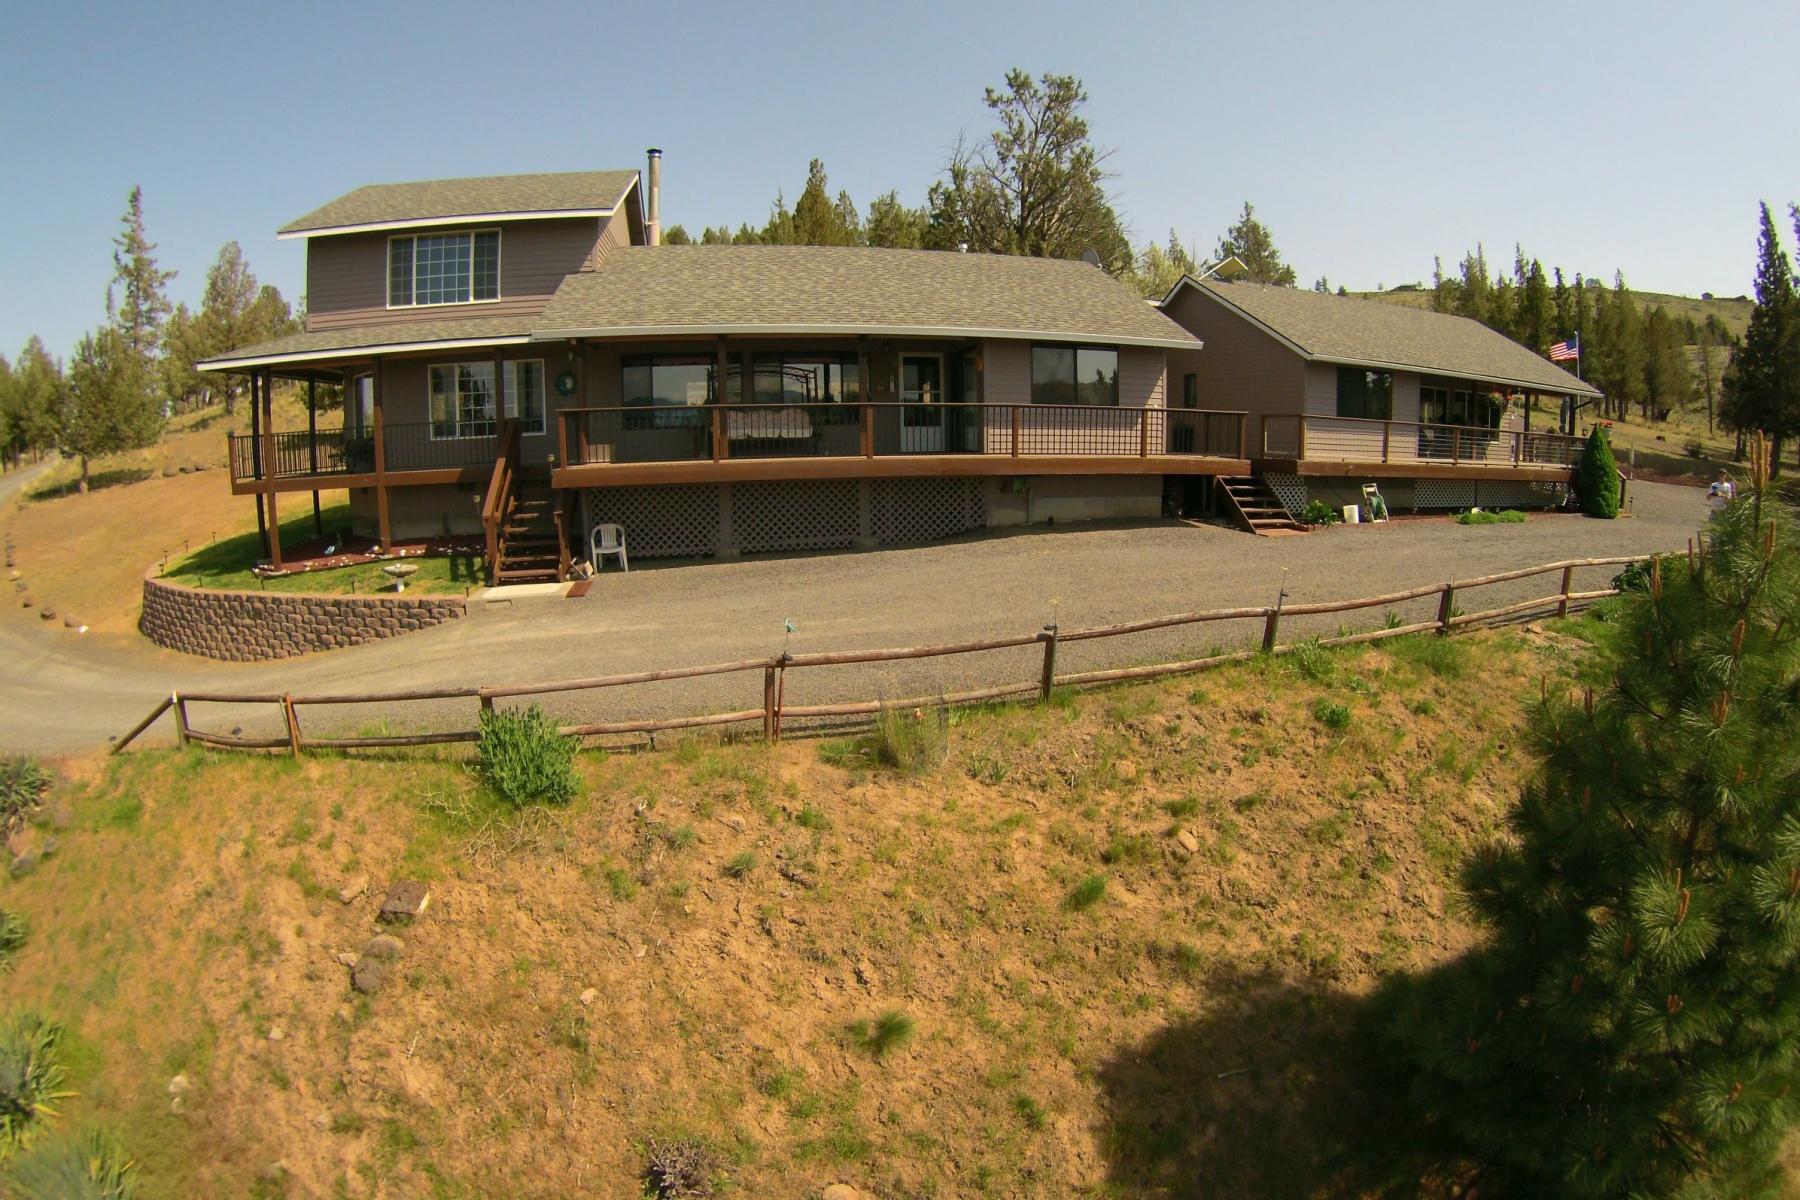 复式单位 为 销售 在 4100 SW Lakeview Drive A & B, CULVER 4100 SW Lakeview Dr A & B 卡尔弗, 俄勒冈州, 97734 美国